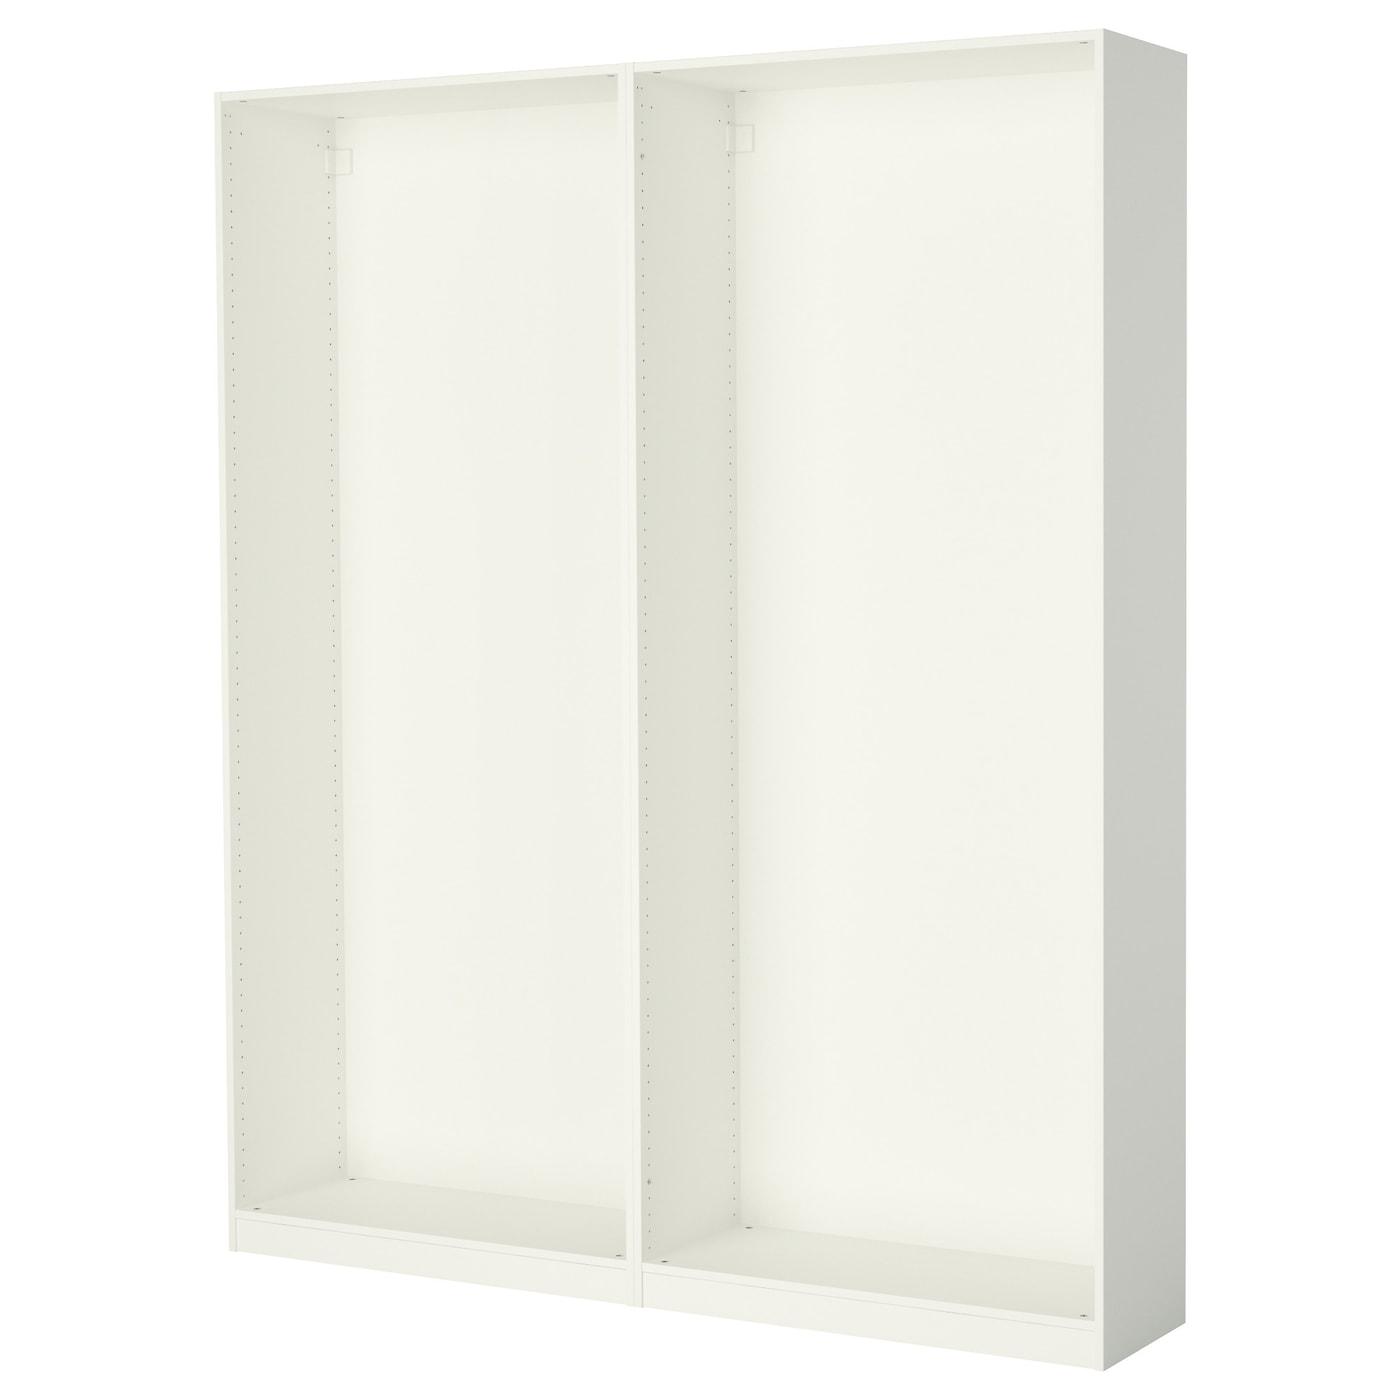 Pax 2 caissons armoire blanc 200 x 35 x 236 cm ikea - Armoire peu profonde ...